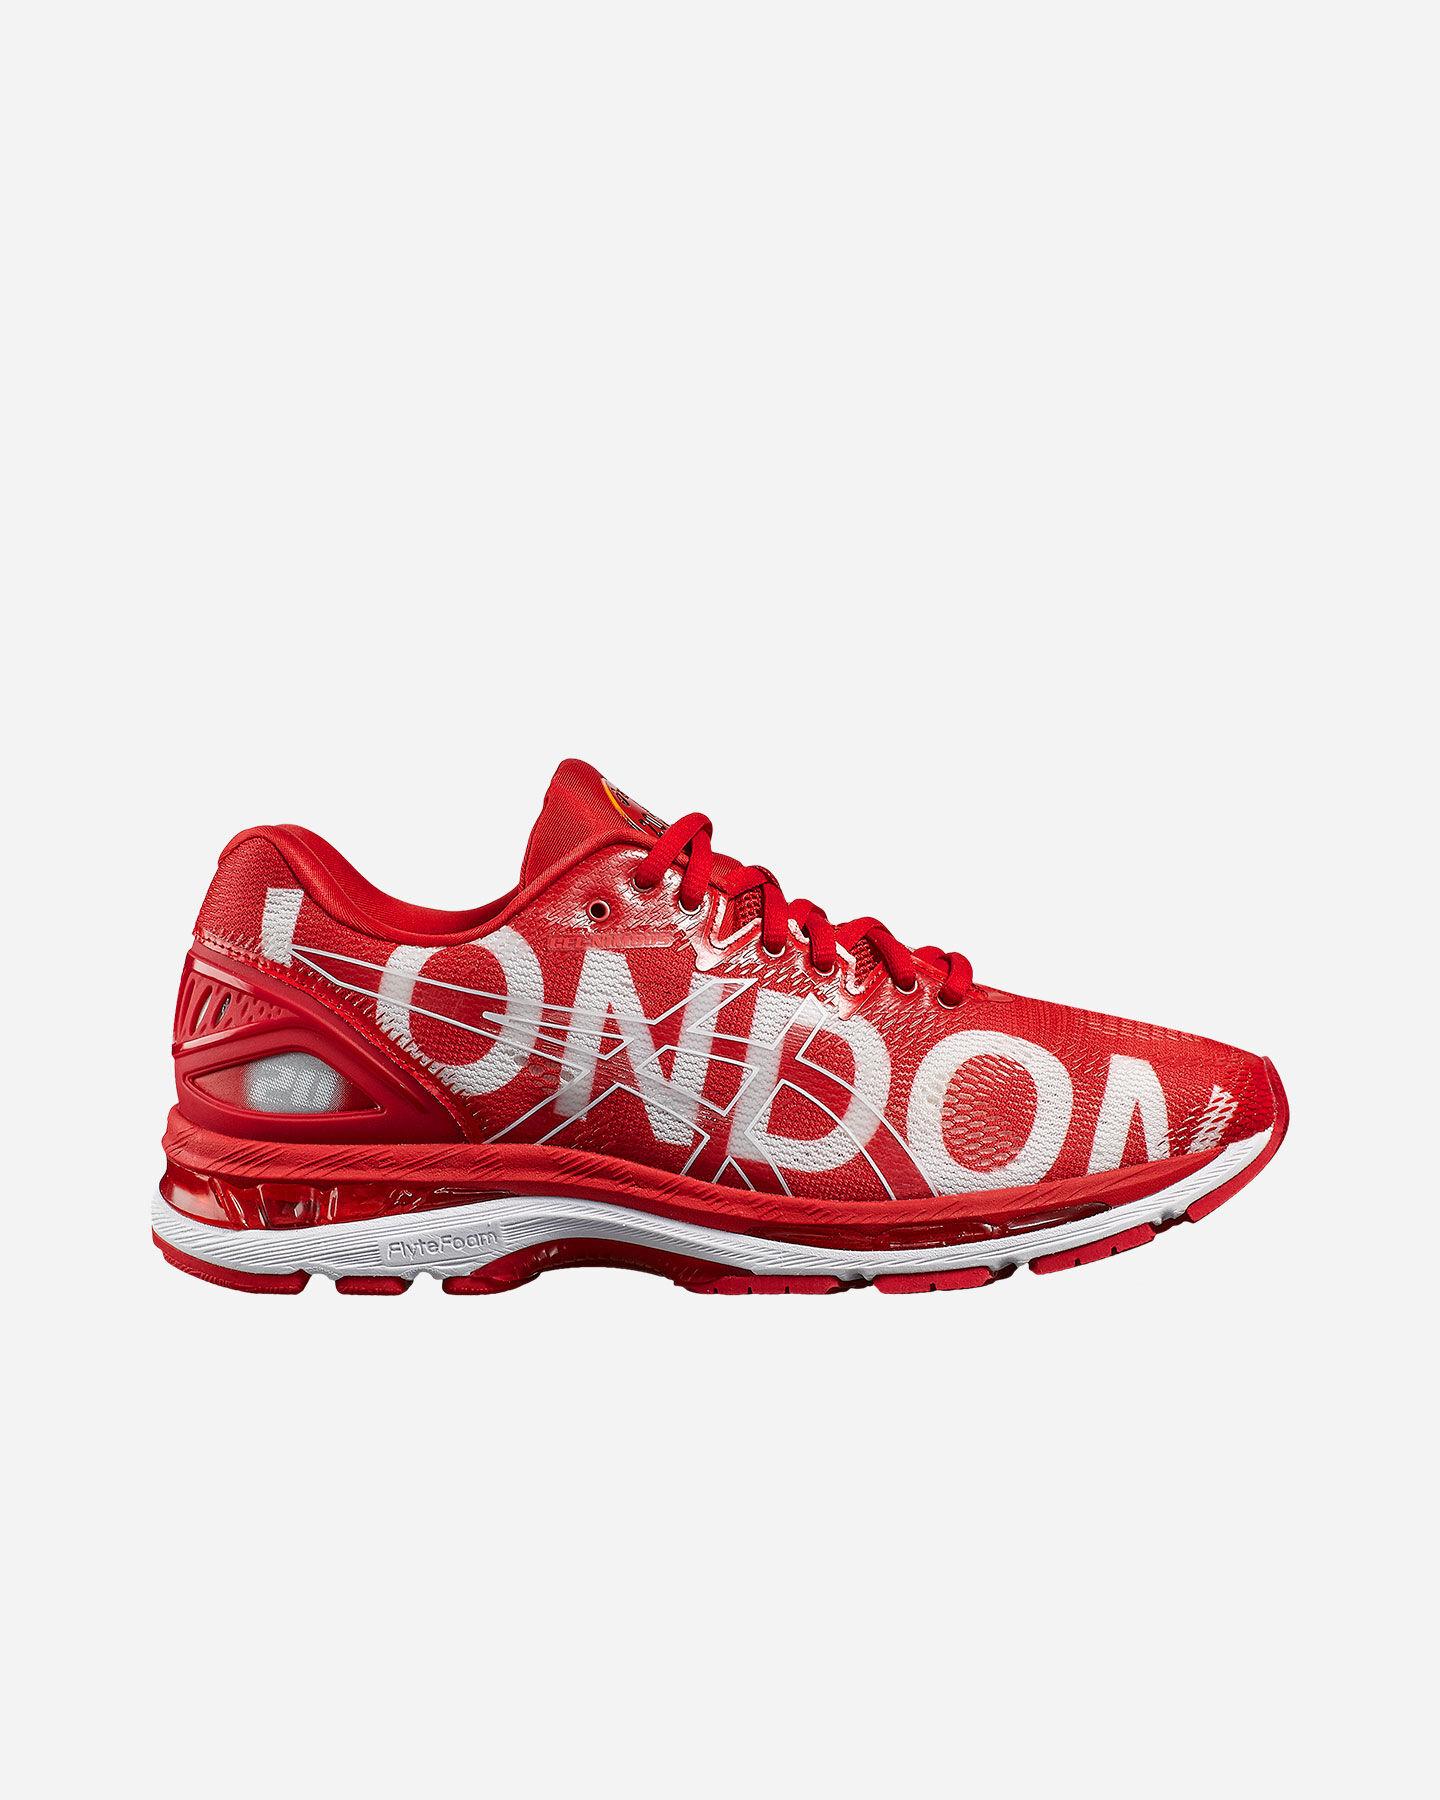 Nike Scarpe Uomo da corsa ginnastica trainers Air Epic velocit 242